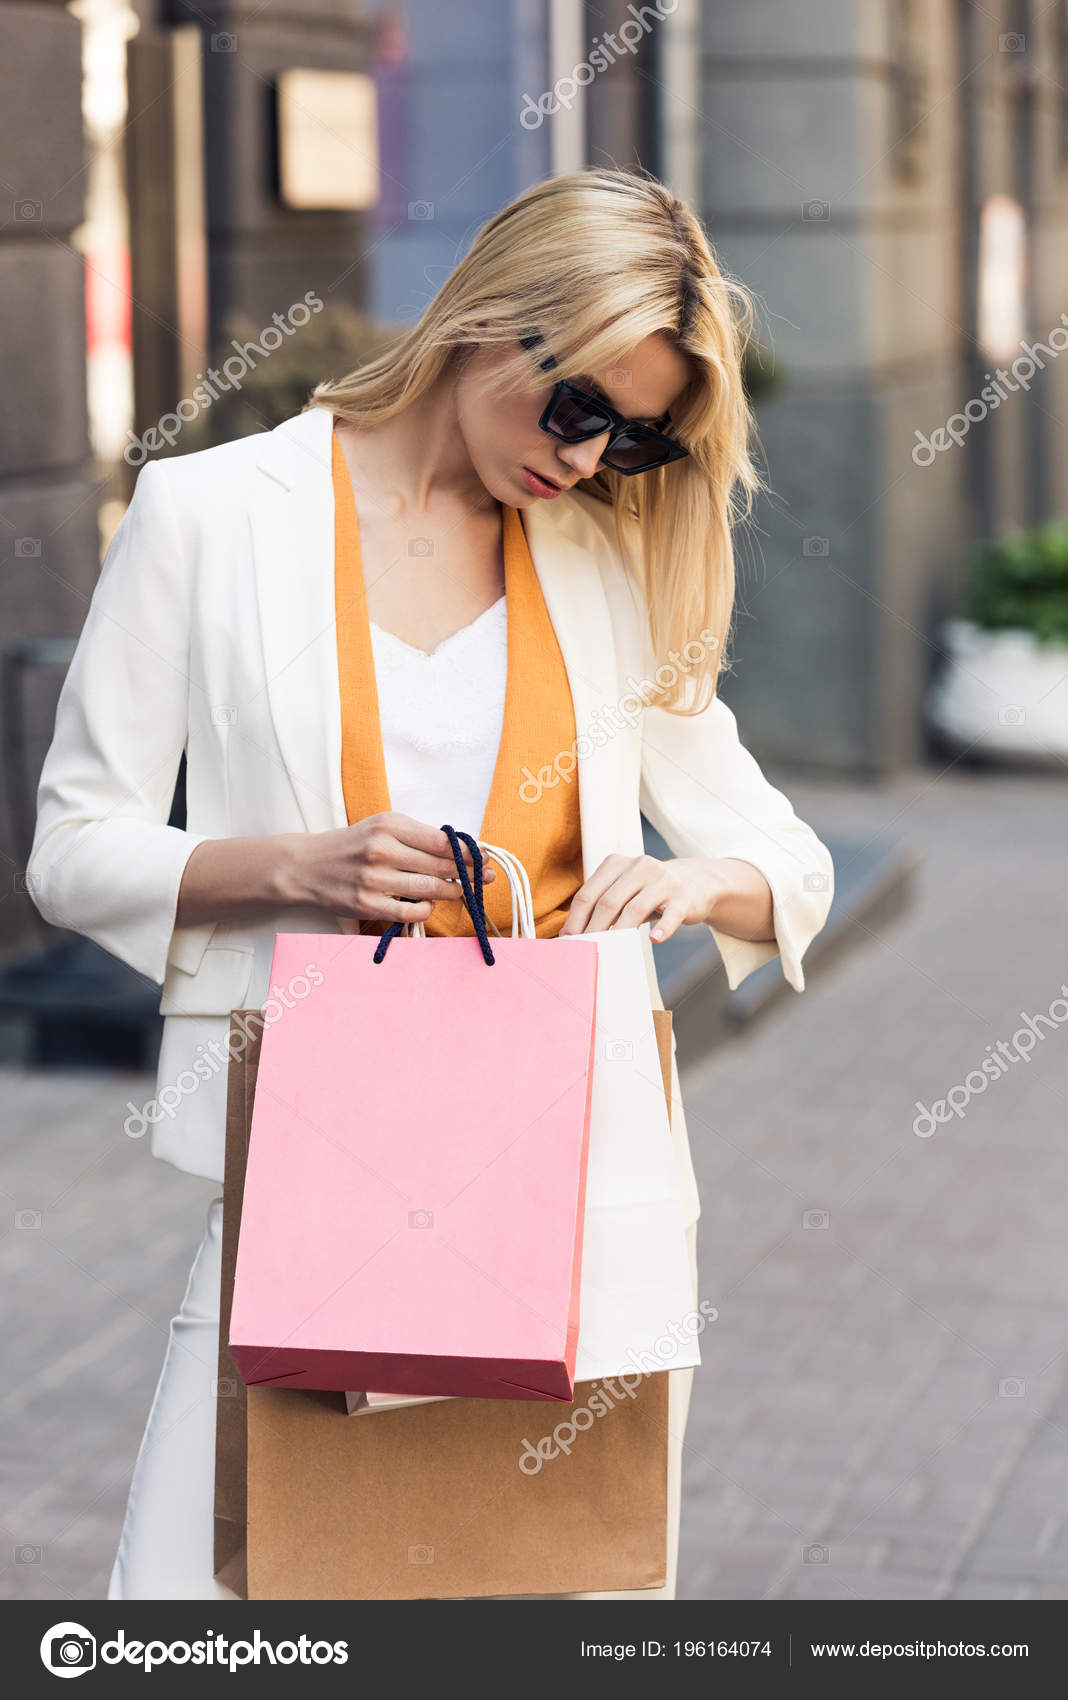 02d4f02ccf Κομψό Νεαρή Γυναίκα Γυαλιά Ηλίου Που Ψάχνει Τσάντες Για Ψώνια — Φωτογραφία  Αρχείου